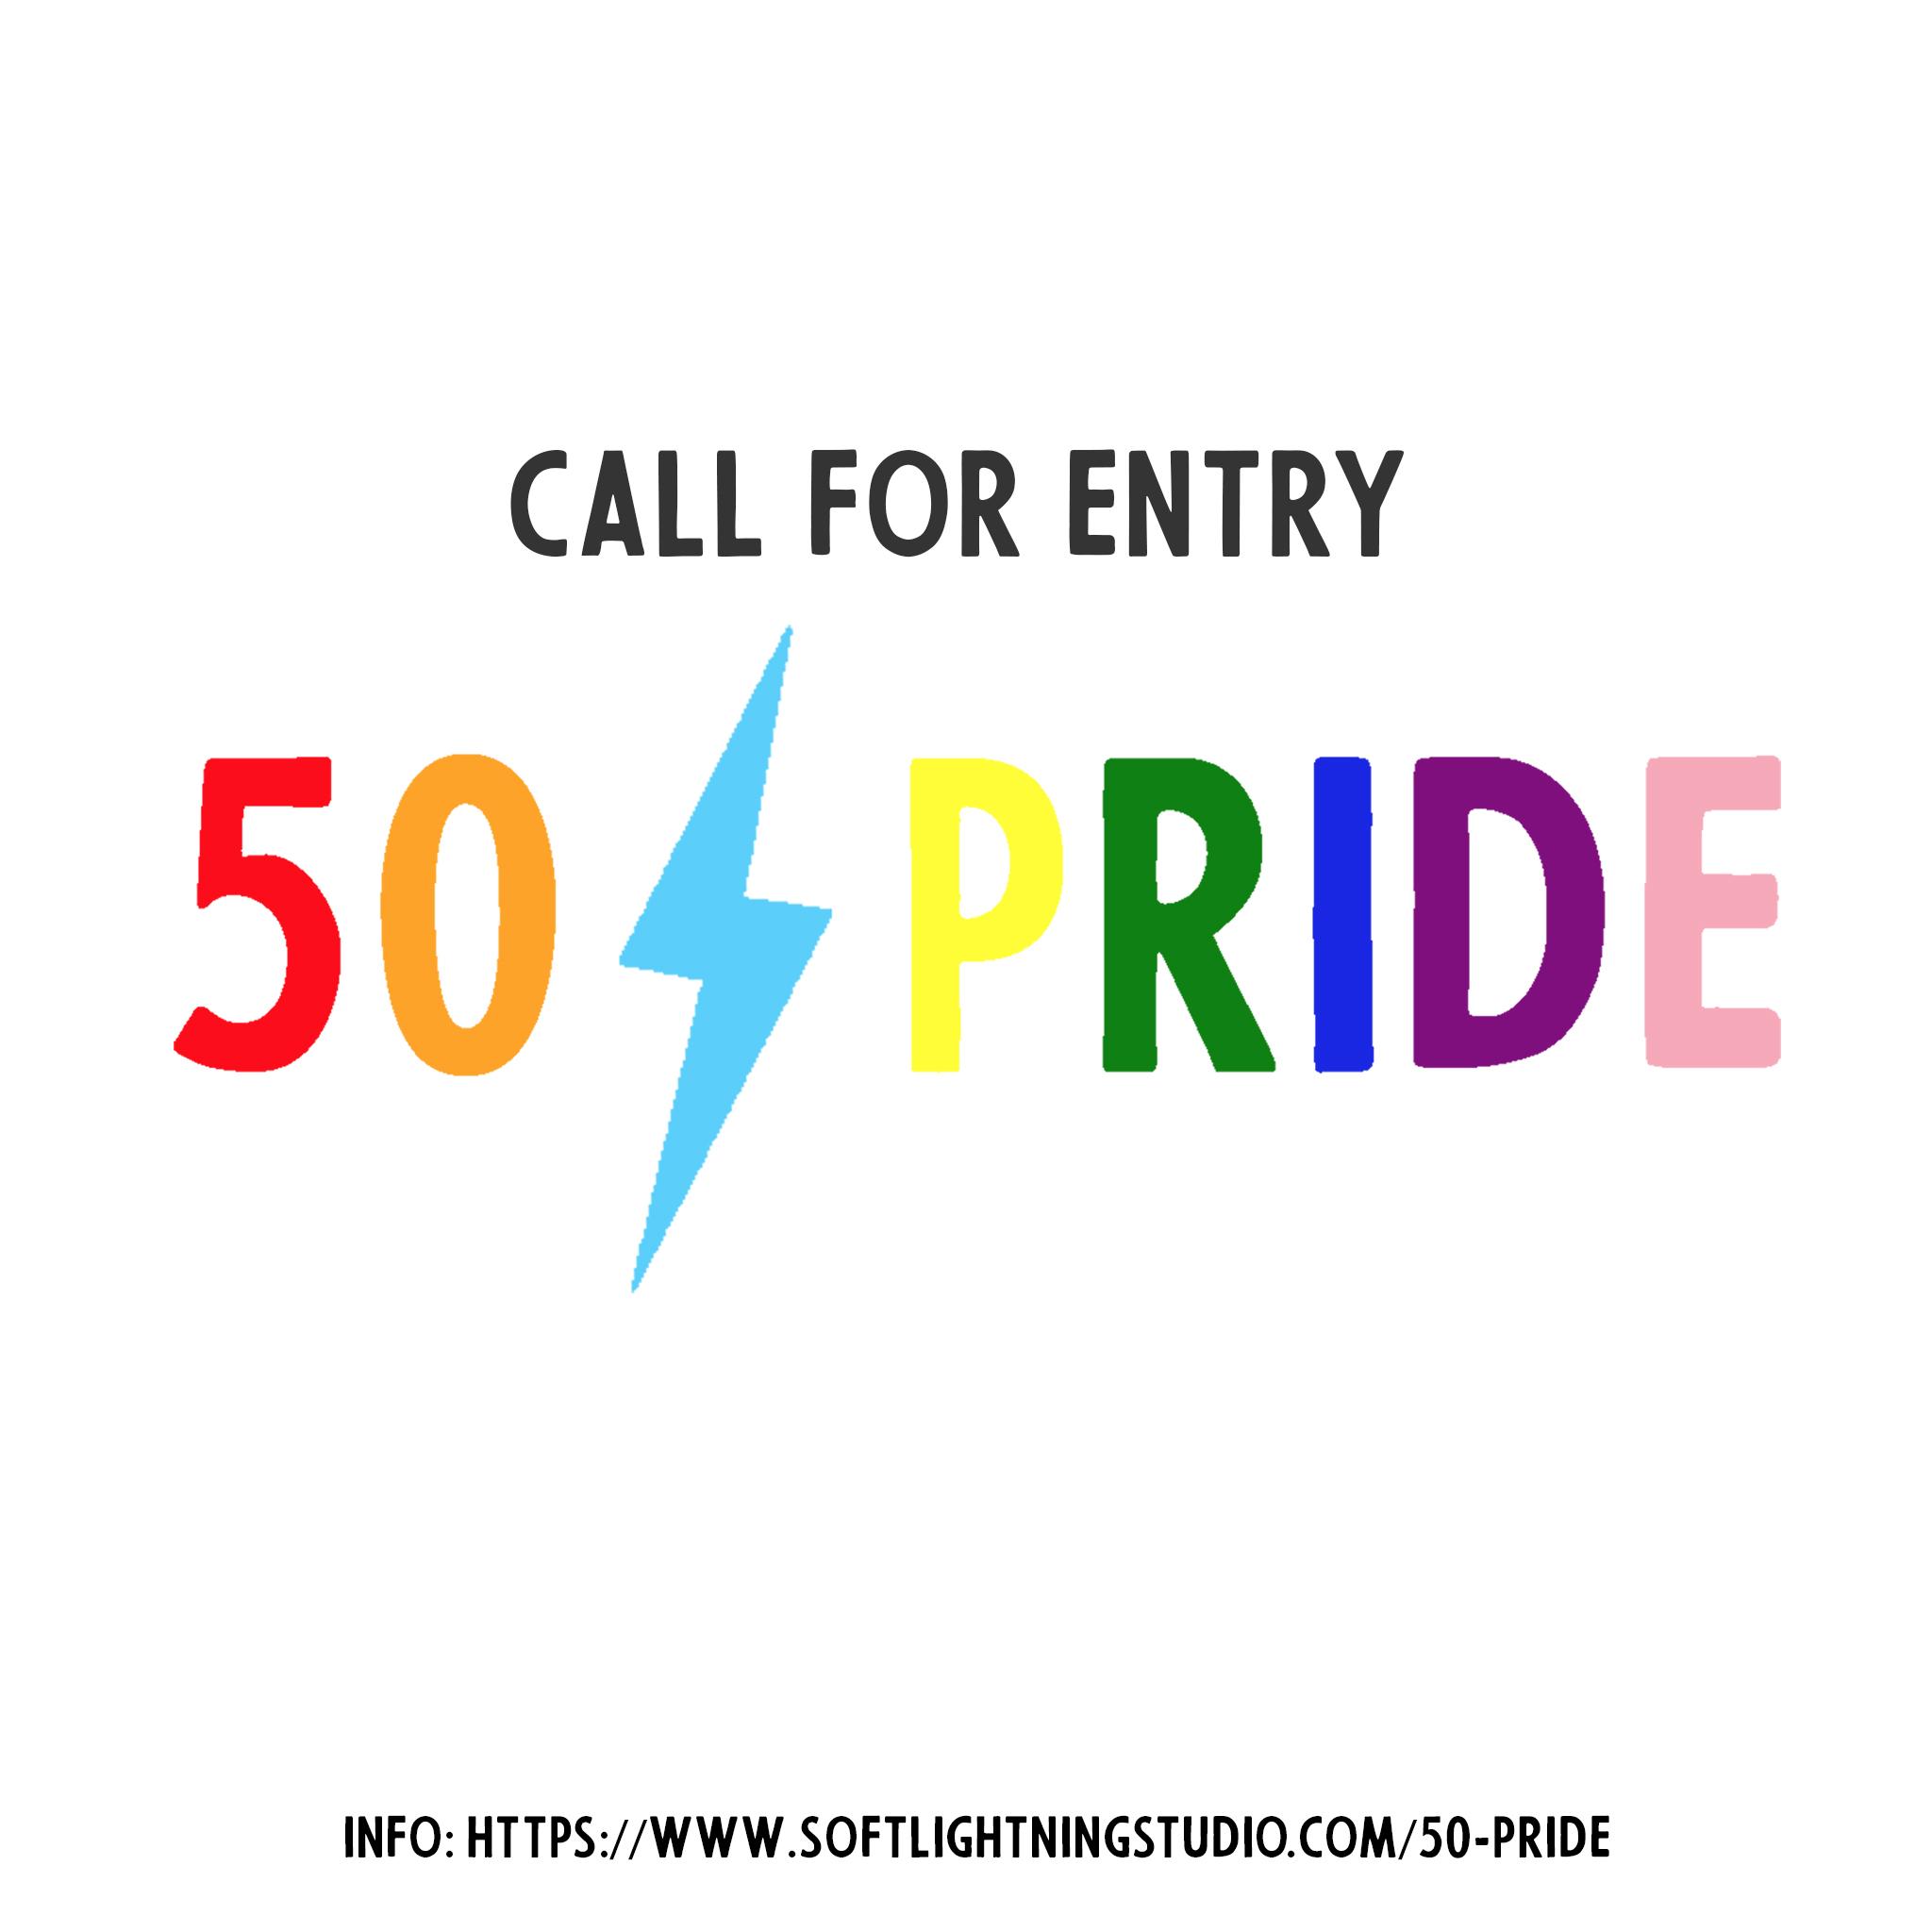 Logo: Call for Entry